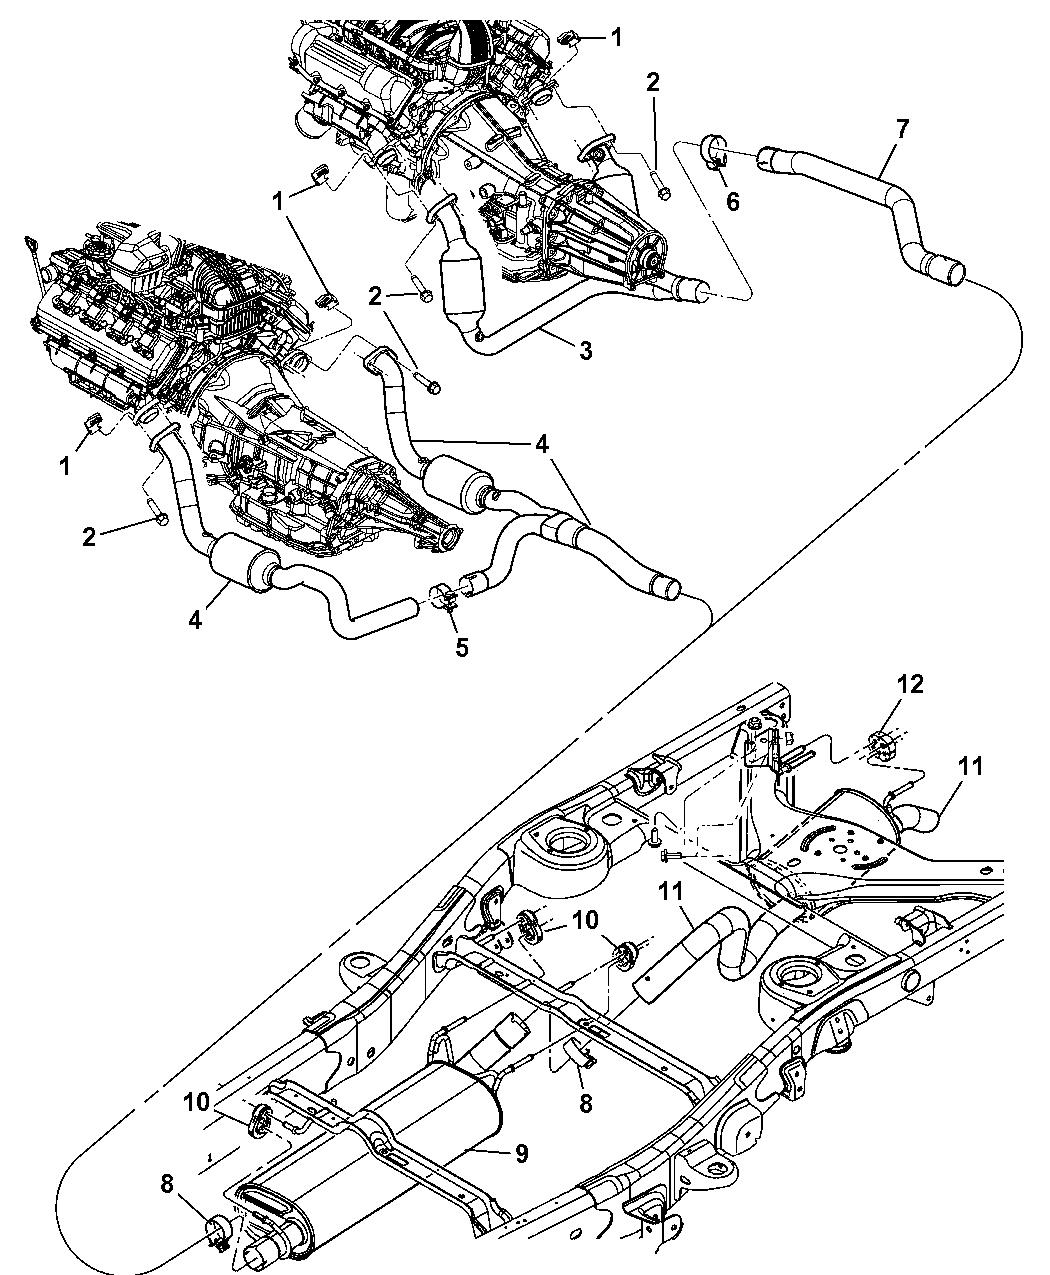 Dodge Durango Exhaust System